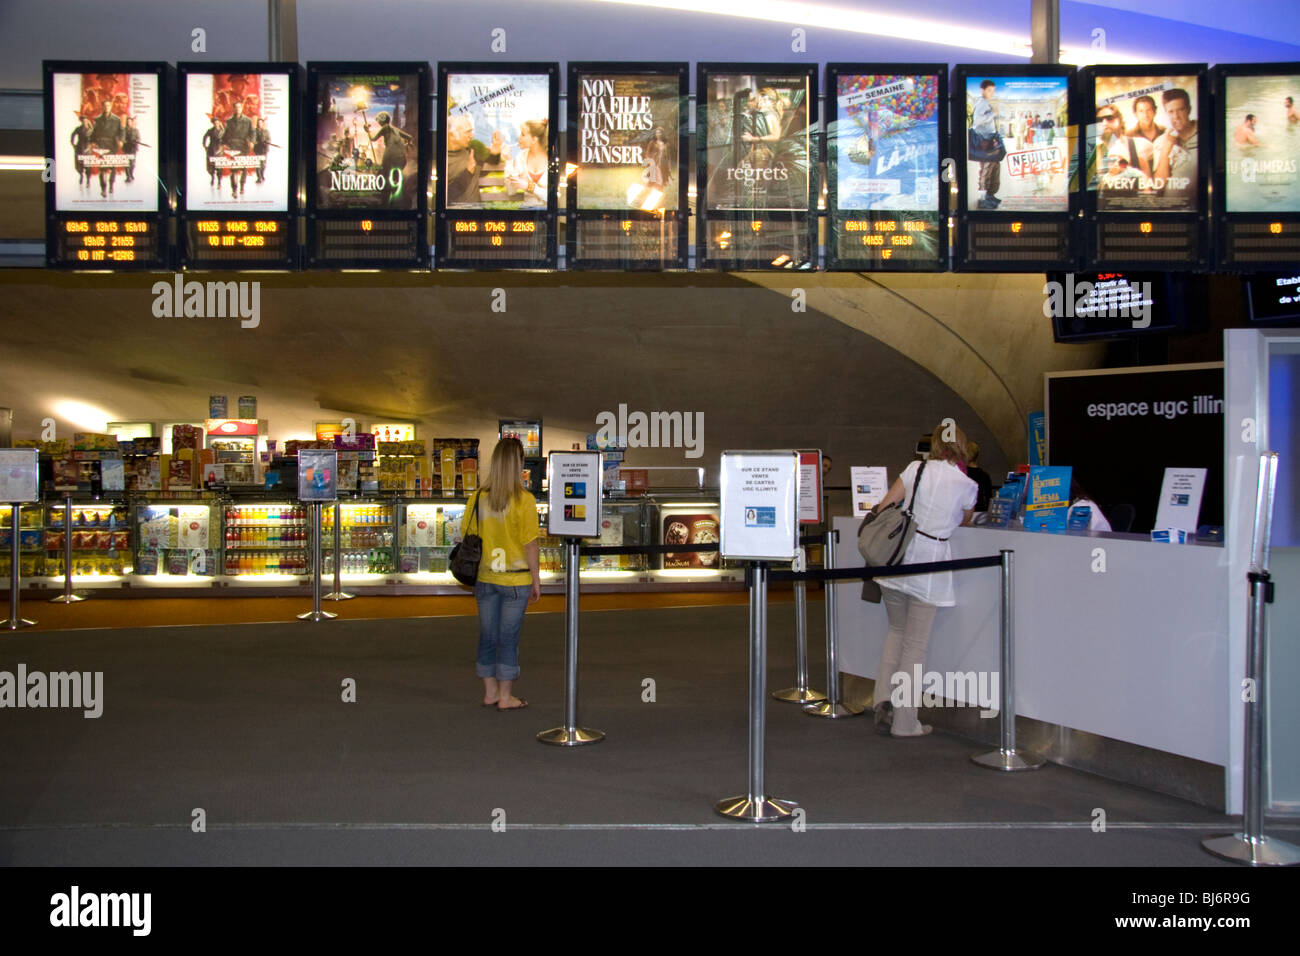 Cinema in ingresso il Forum des Halles di Parigi, Francia. Immagini Stock